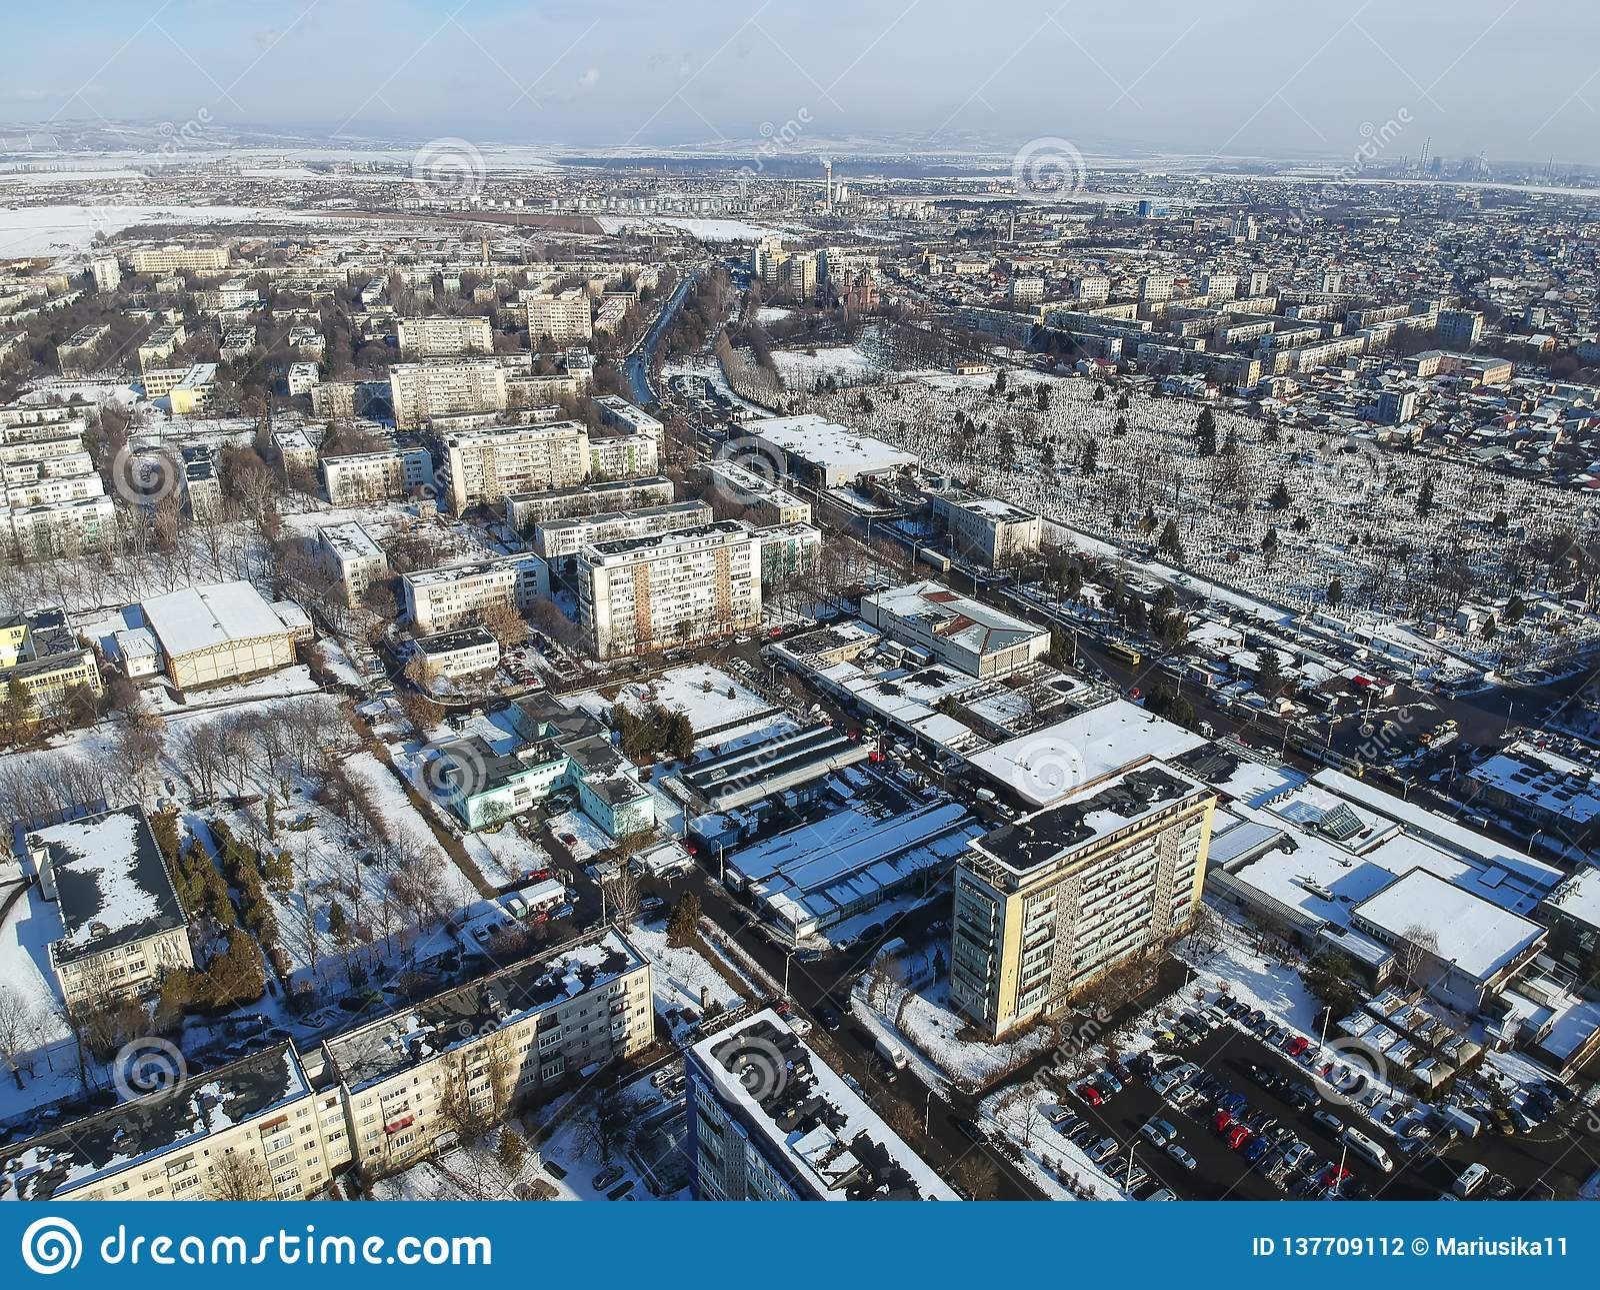 Ploiesti City, Romania, East District, aerial view